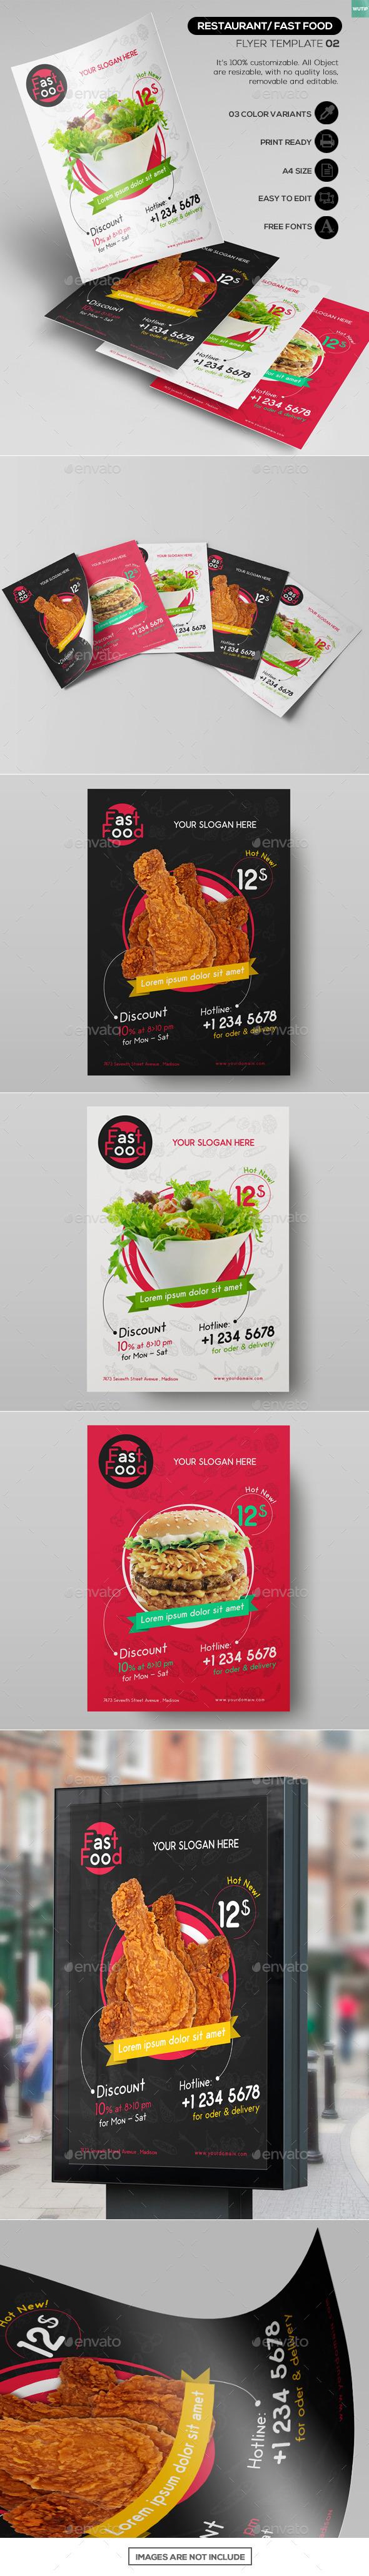 Restaurant/ Fast Food - Flyer Template 02 - Restaurant Flyers